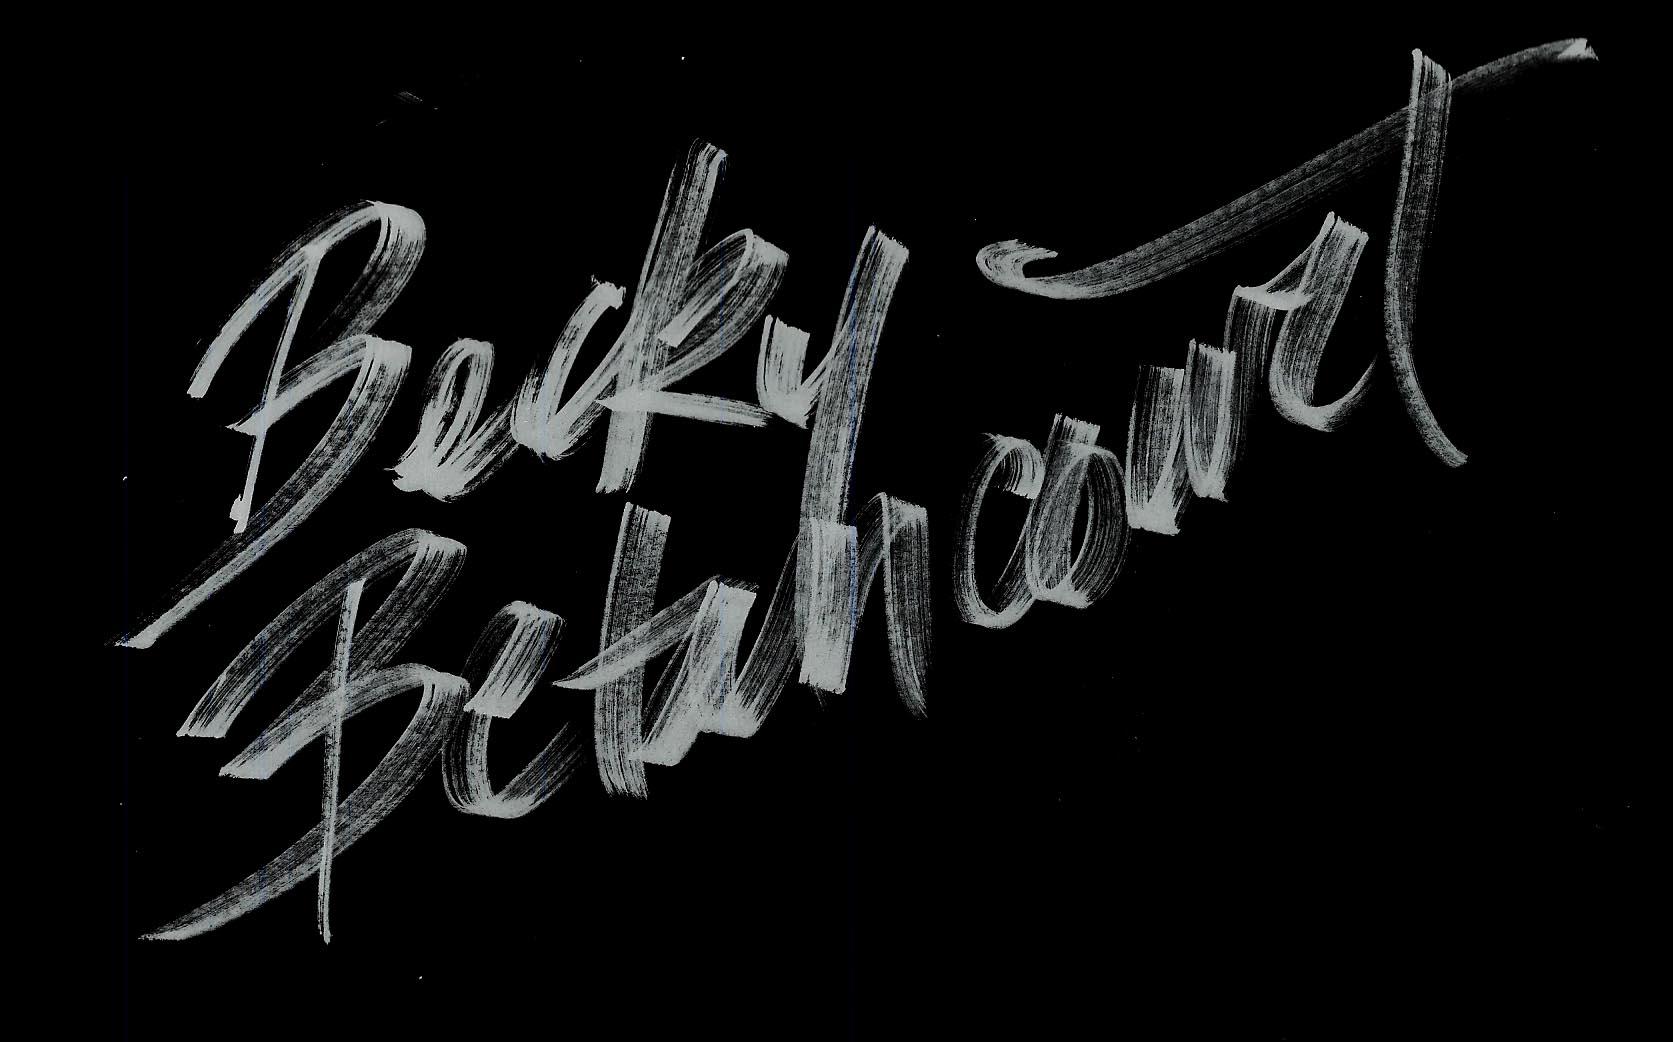 Becky betancourt's Signature